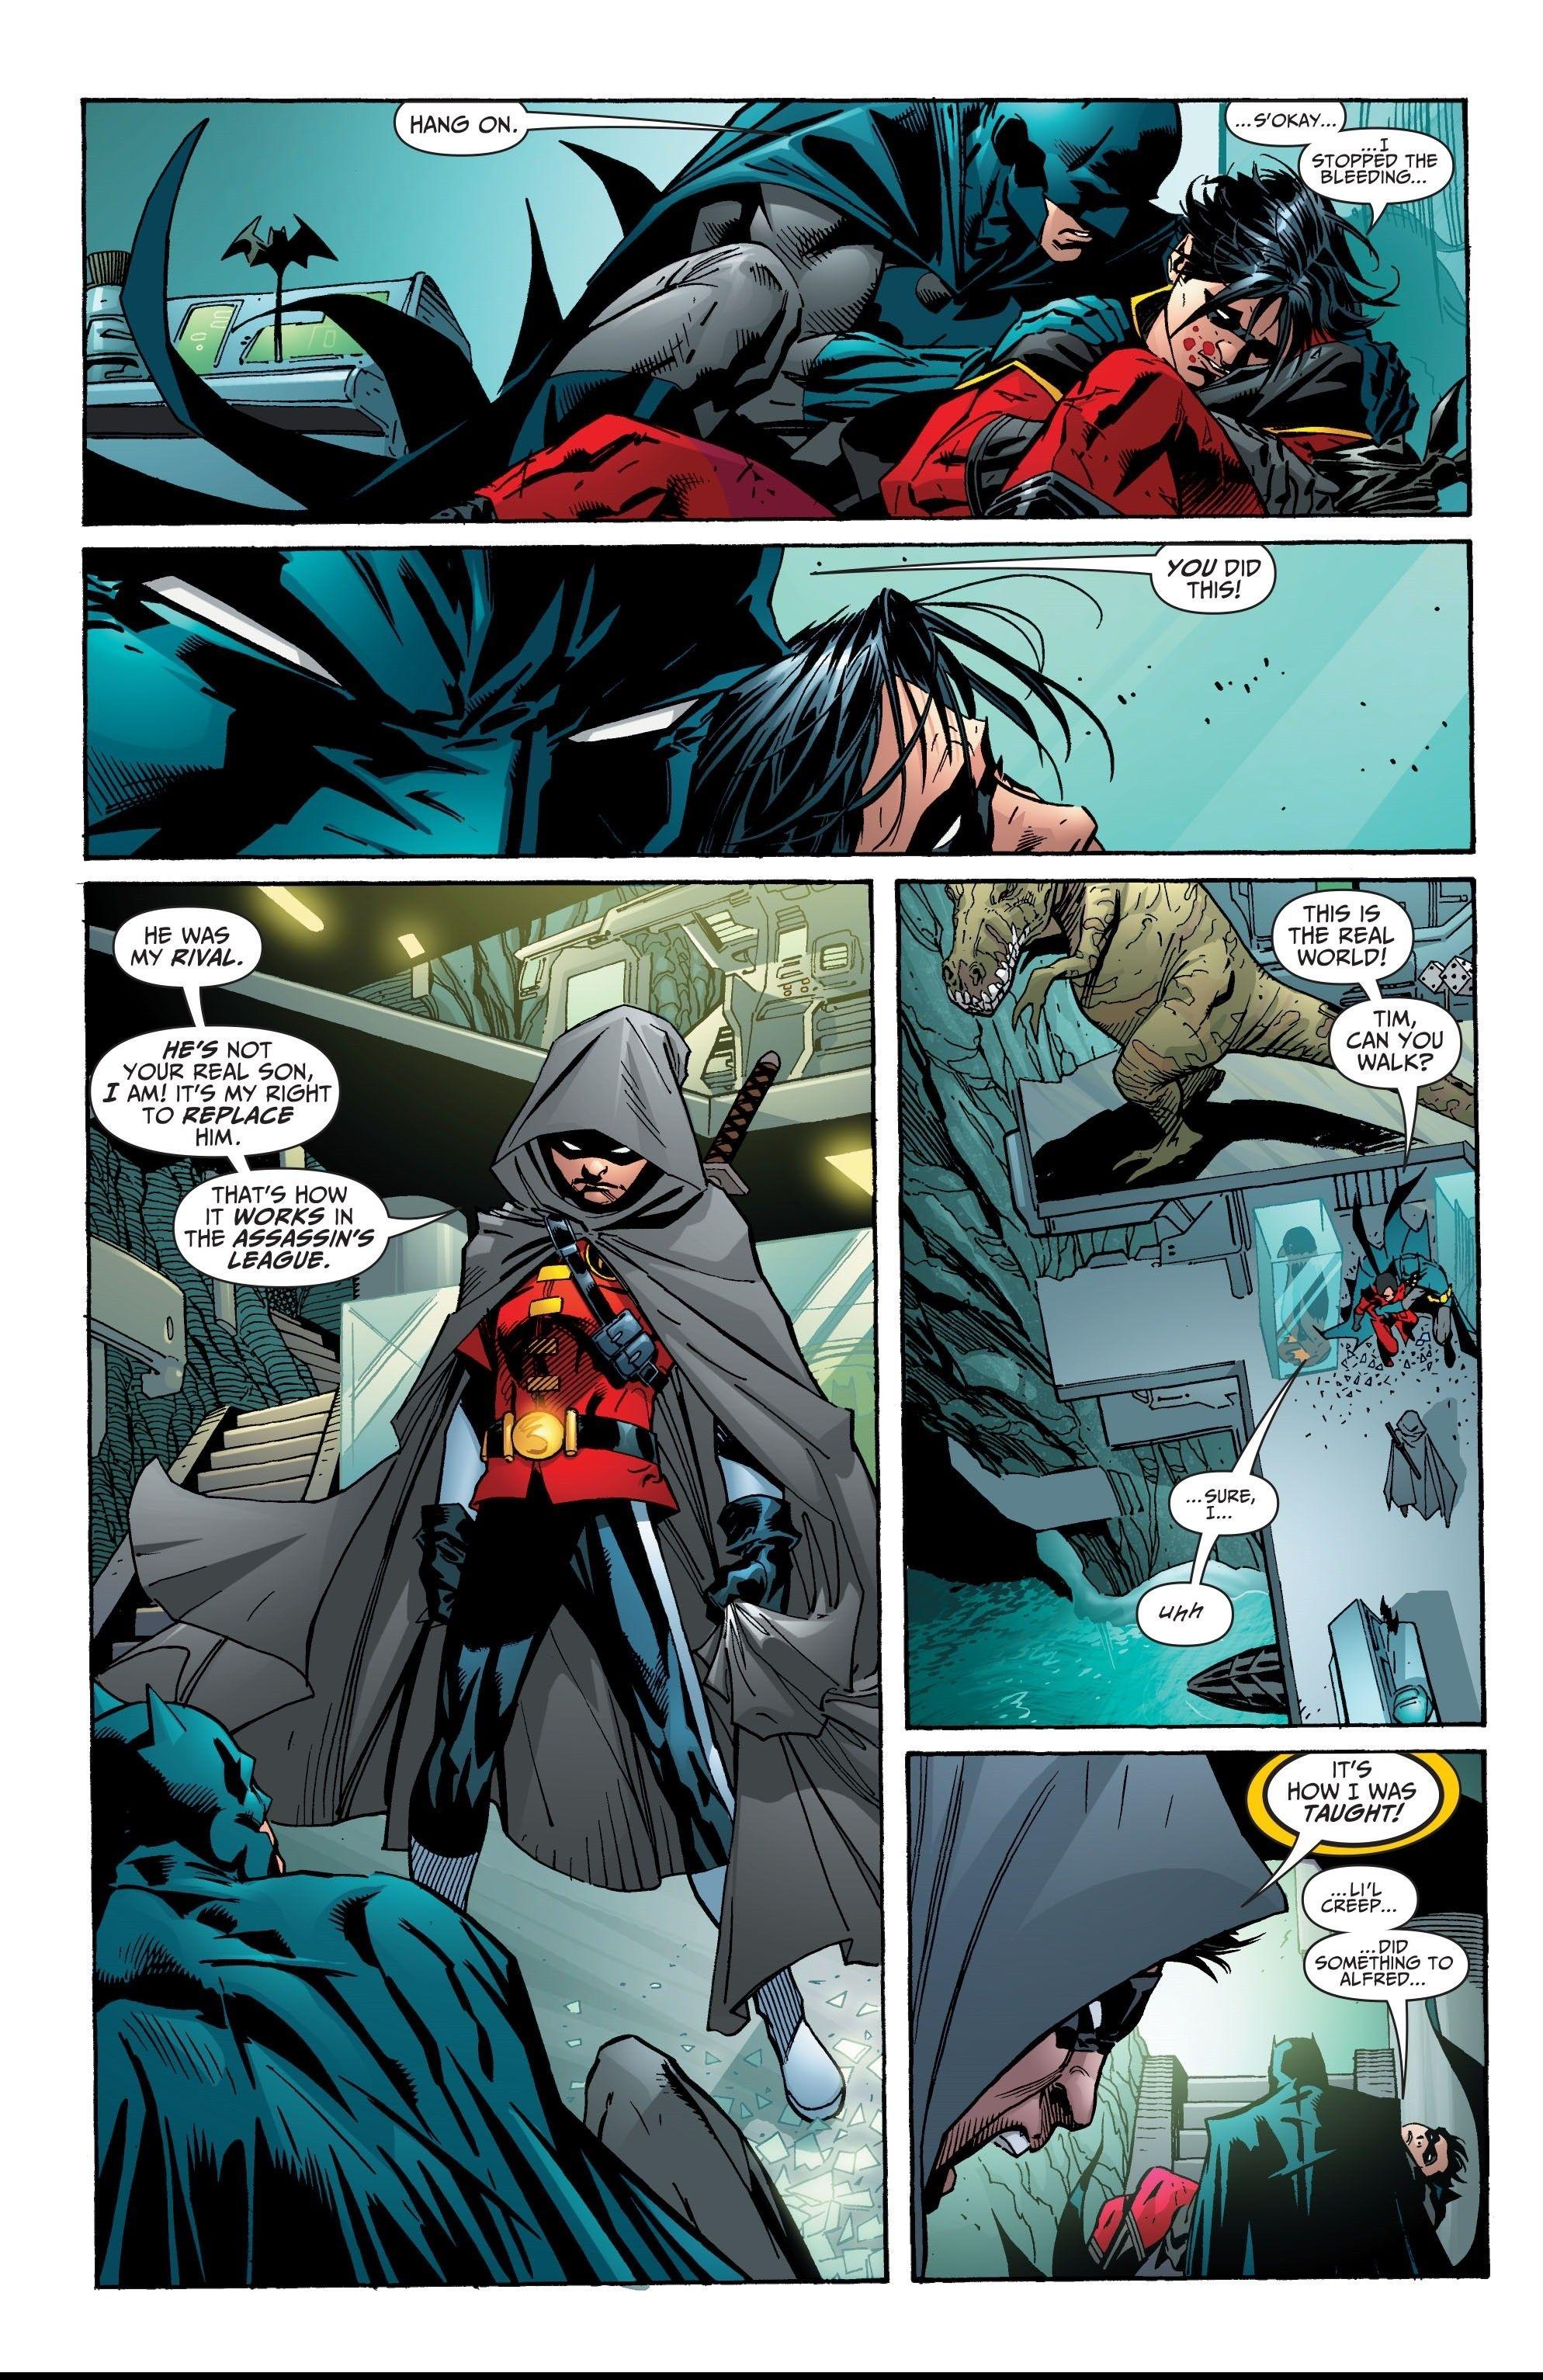 Reply, dick grayson becomes batman confirm